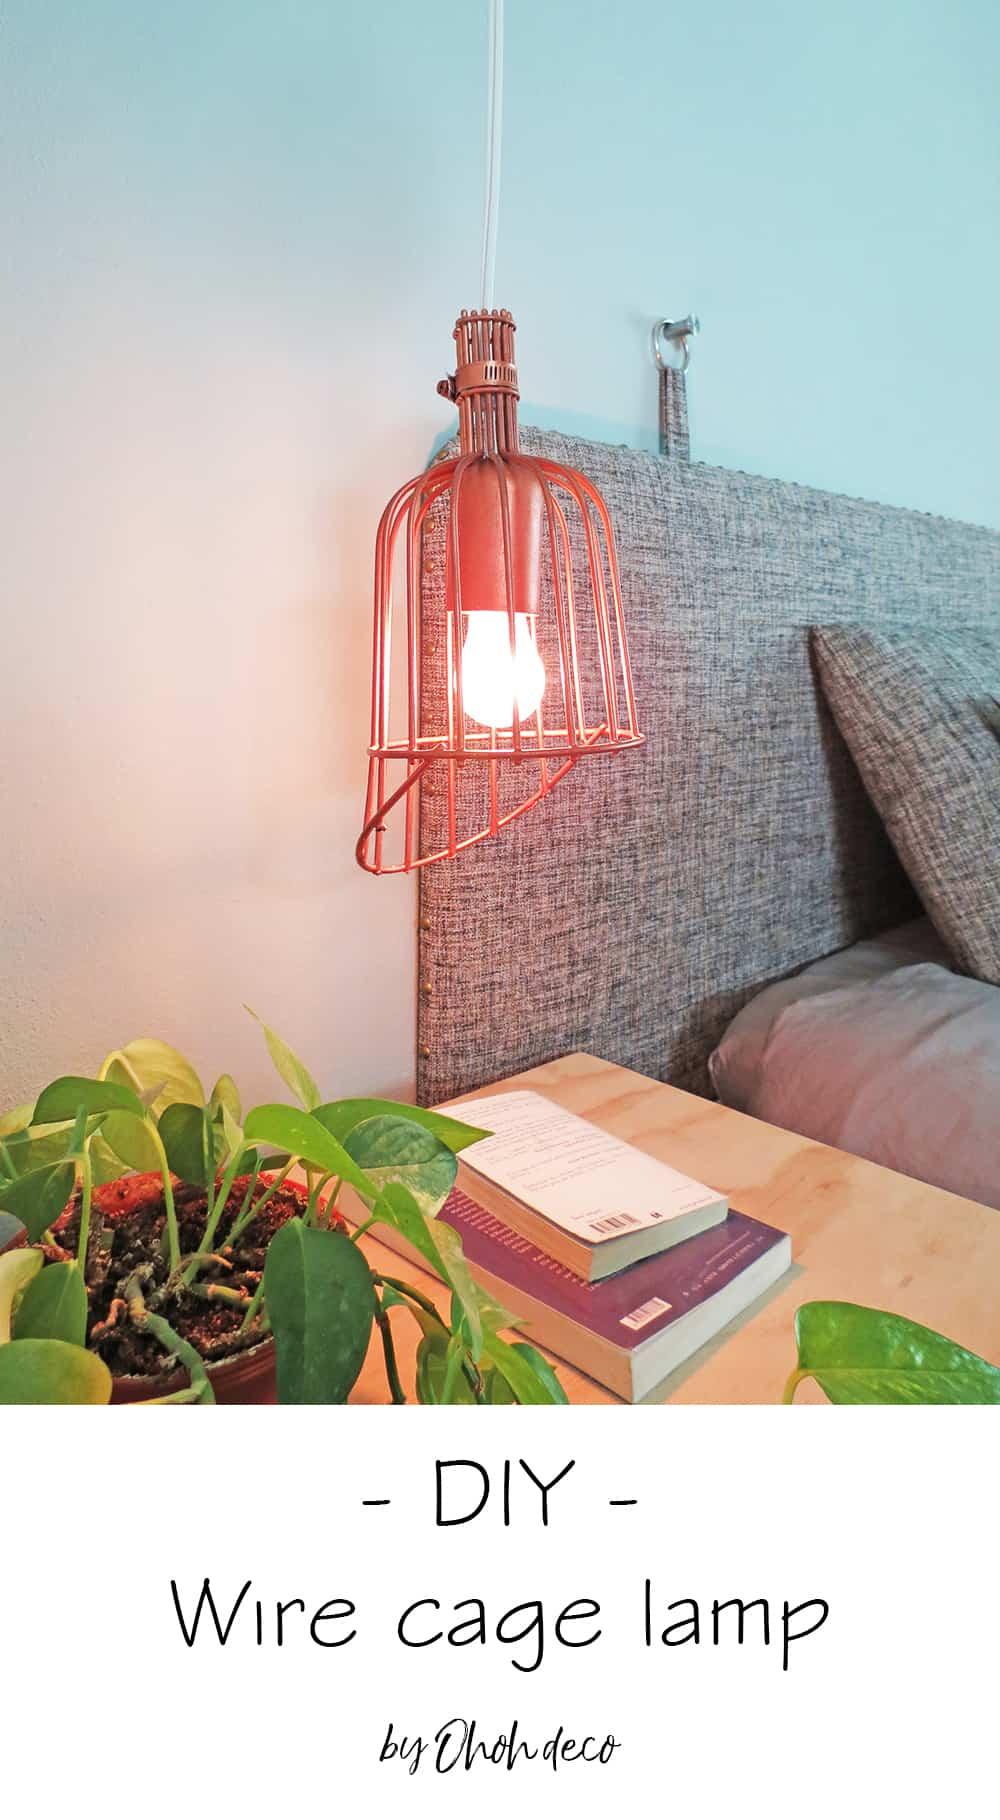 DIY wire cage lamp #light #lighting #diy #cagelamp #copper